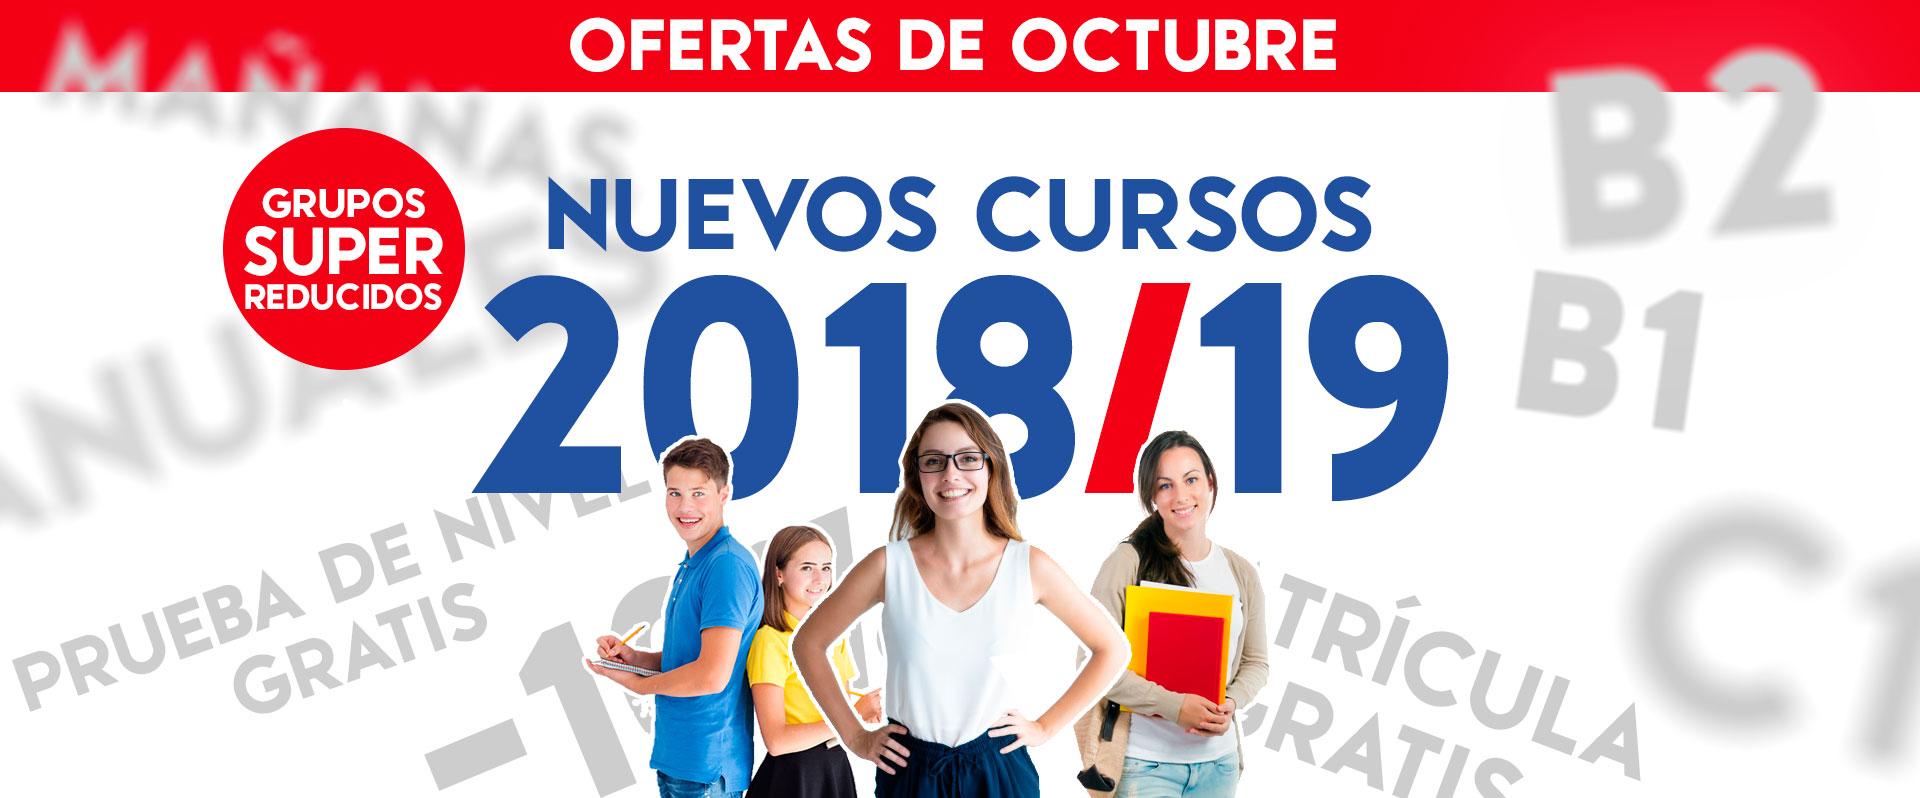 Ofertas Octubre en Academia de Inglés Zaragoza The English Way